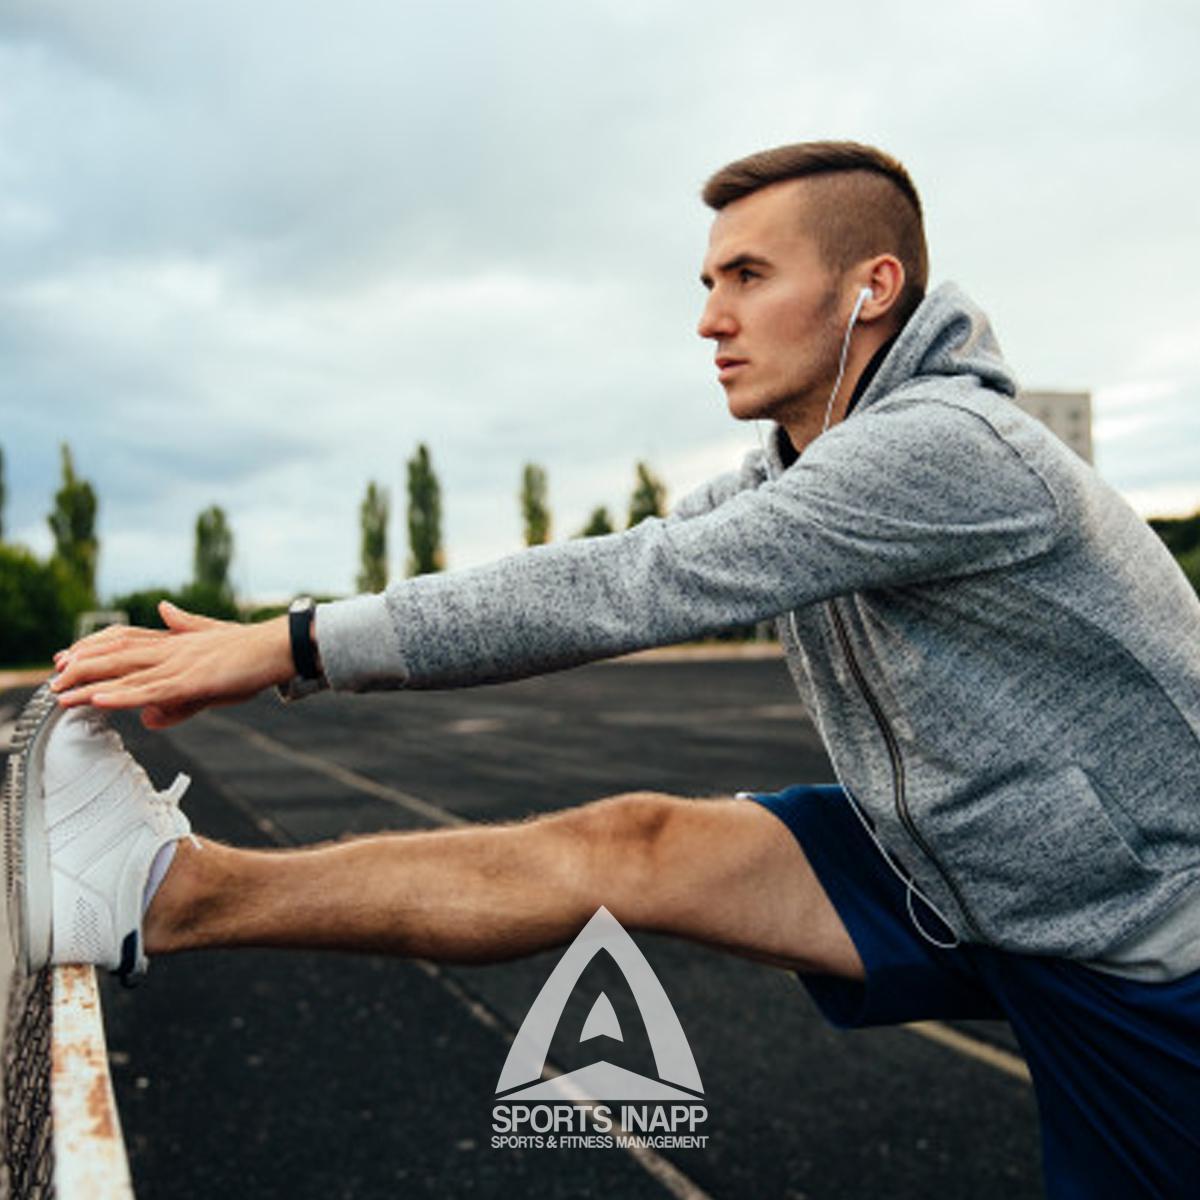 Sports In APP - Fitness